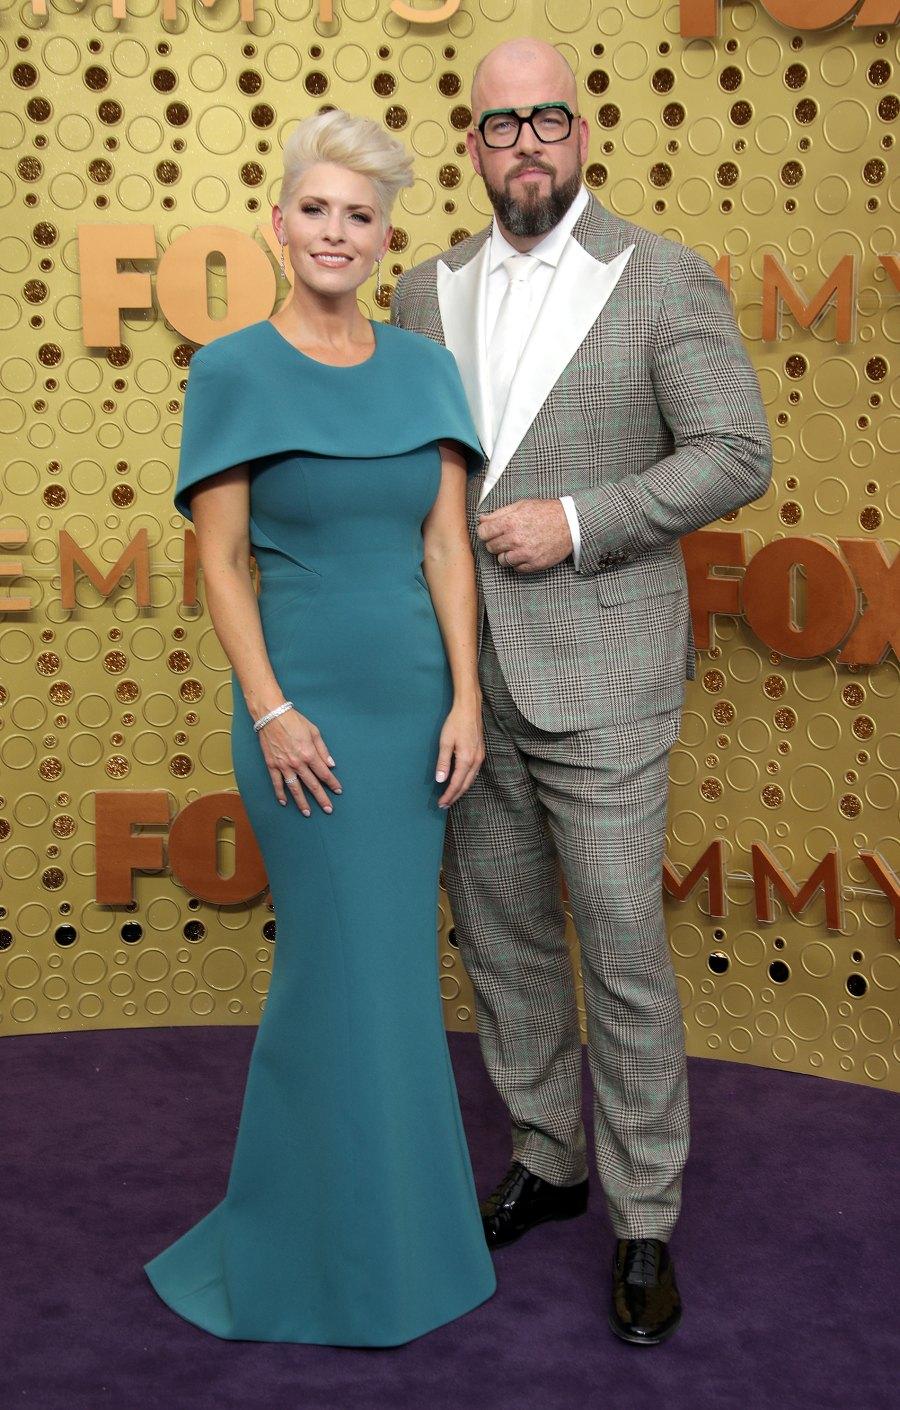 Emmys 2019 Stylish Couples - Chris Sullivan and Rachel Reichard